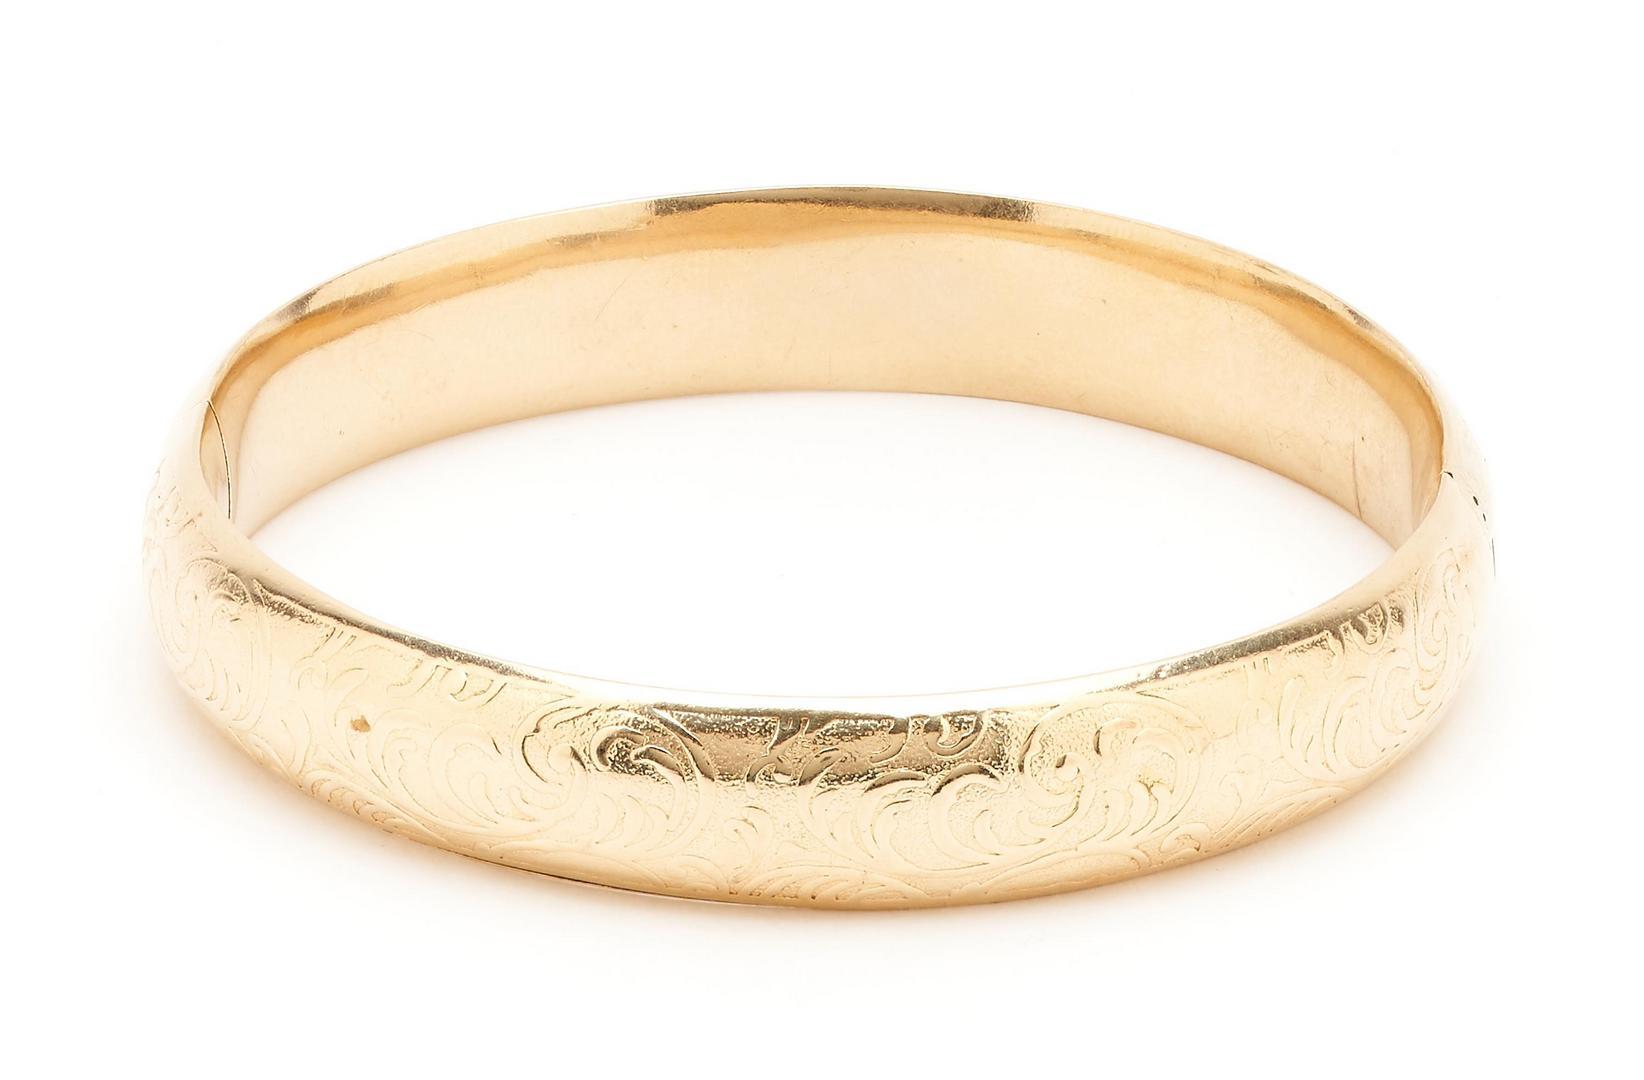 Lot 271: 14K Bangle Bracelet & 18K Hieroglyphic Pendant, 2 items